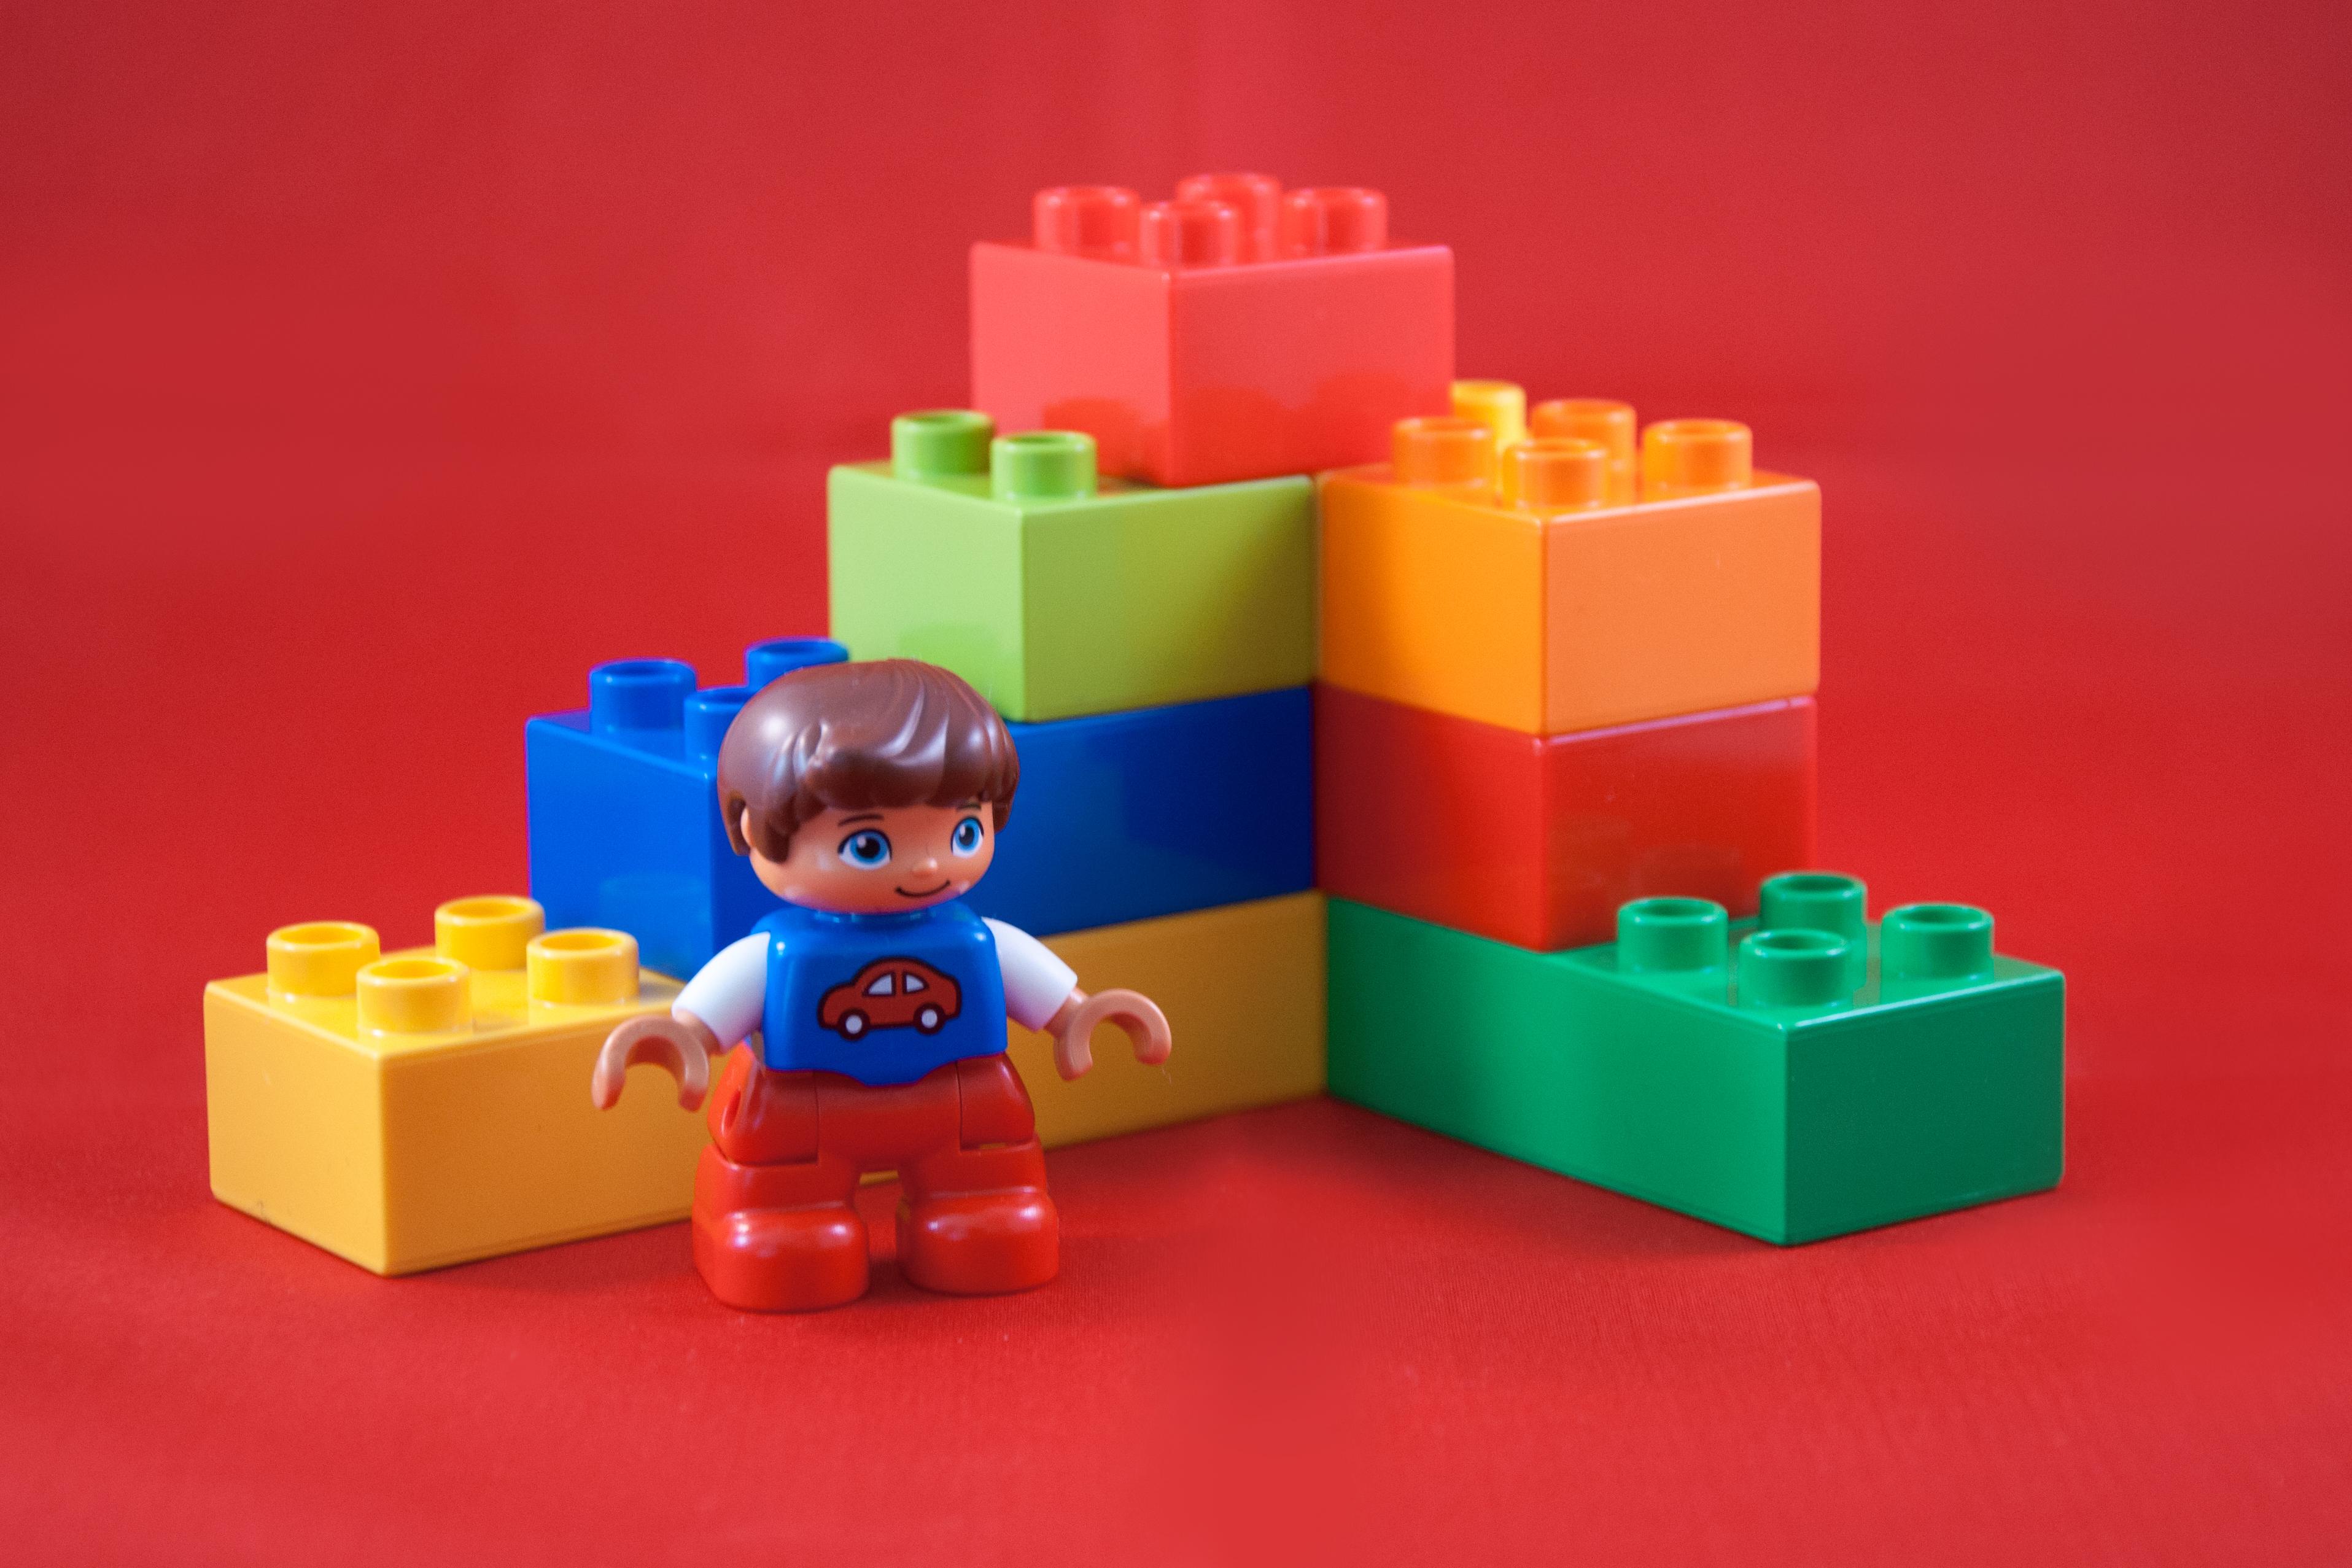 Duplo lego toy blocks photo